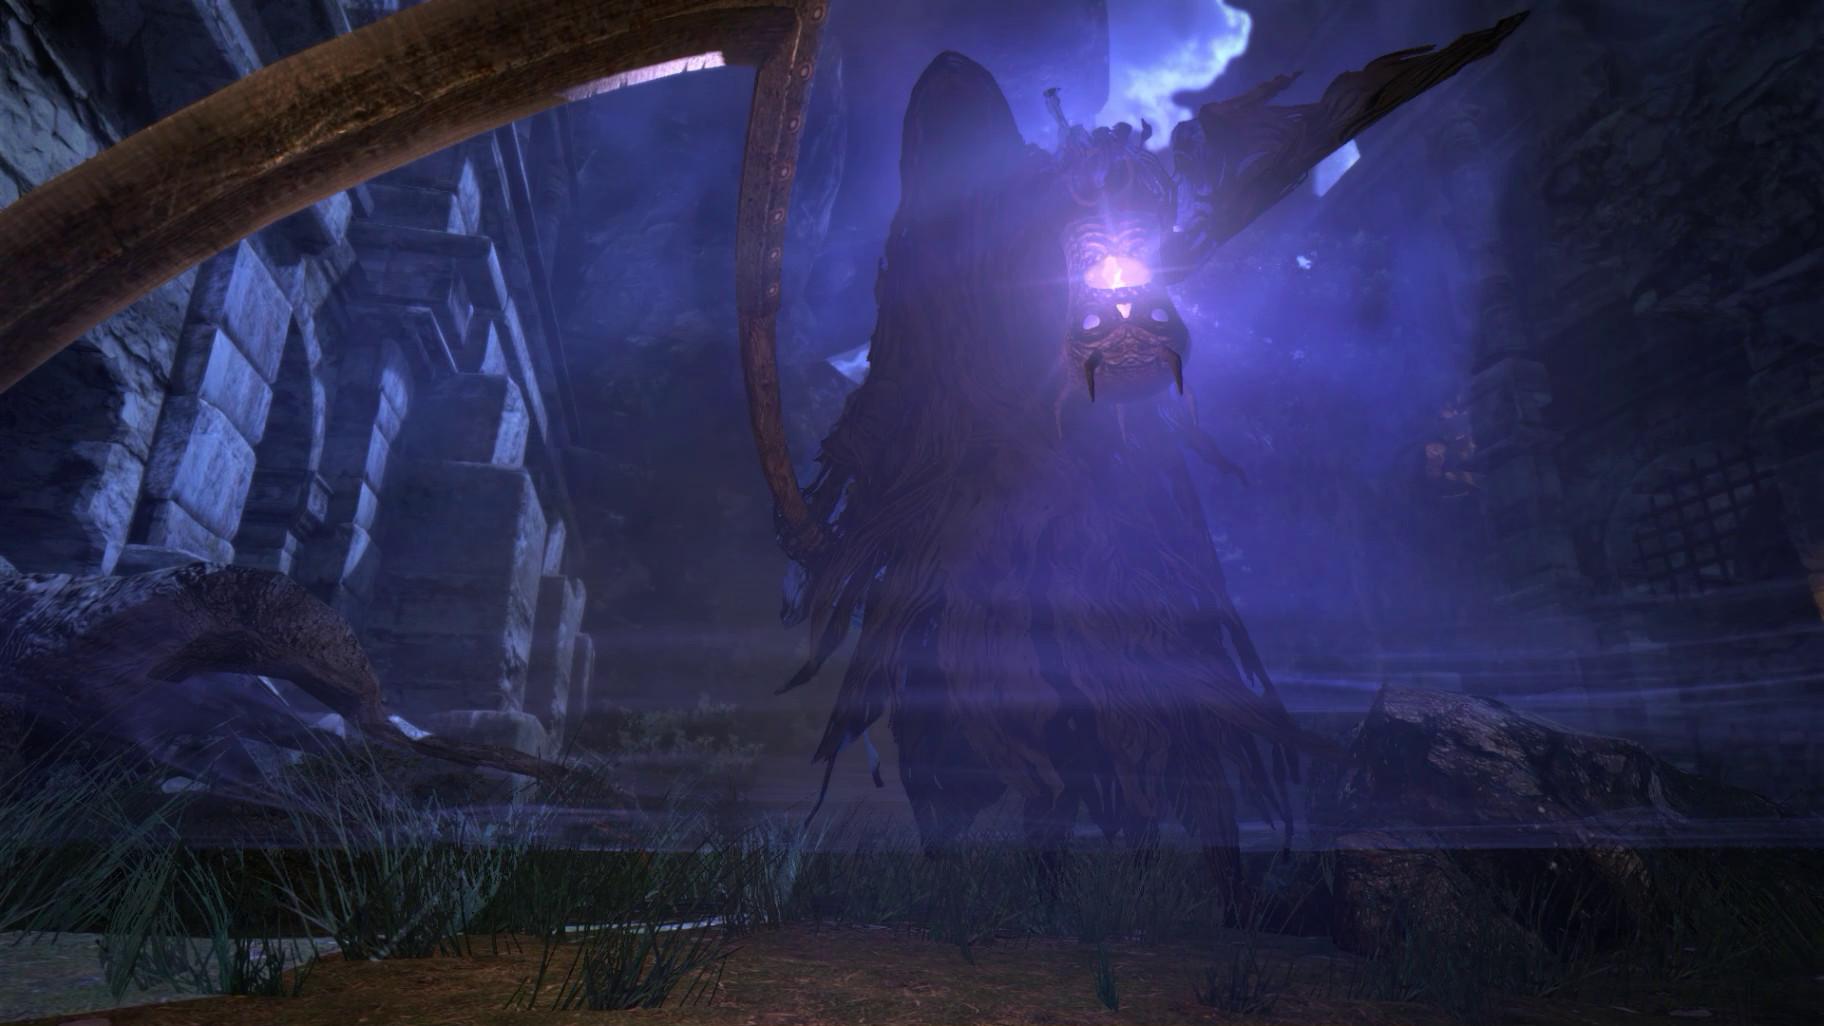 04. Reaper of souls